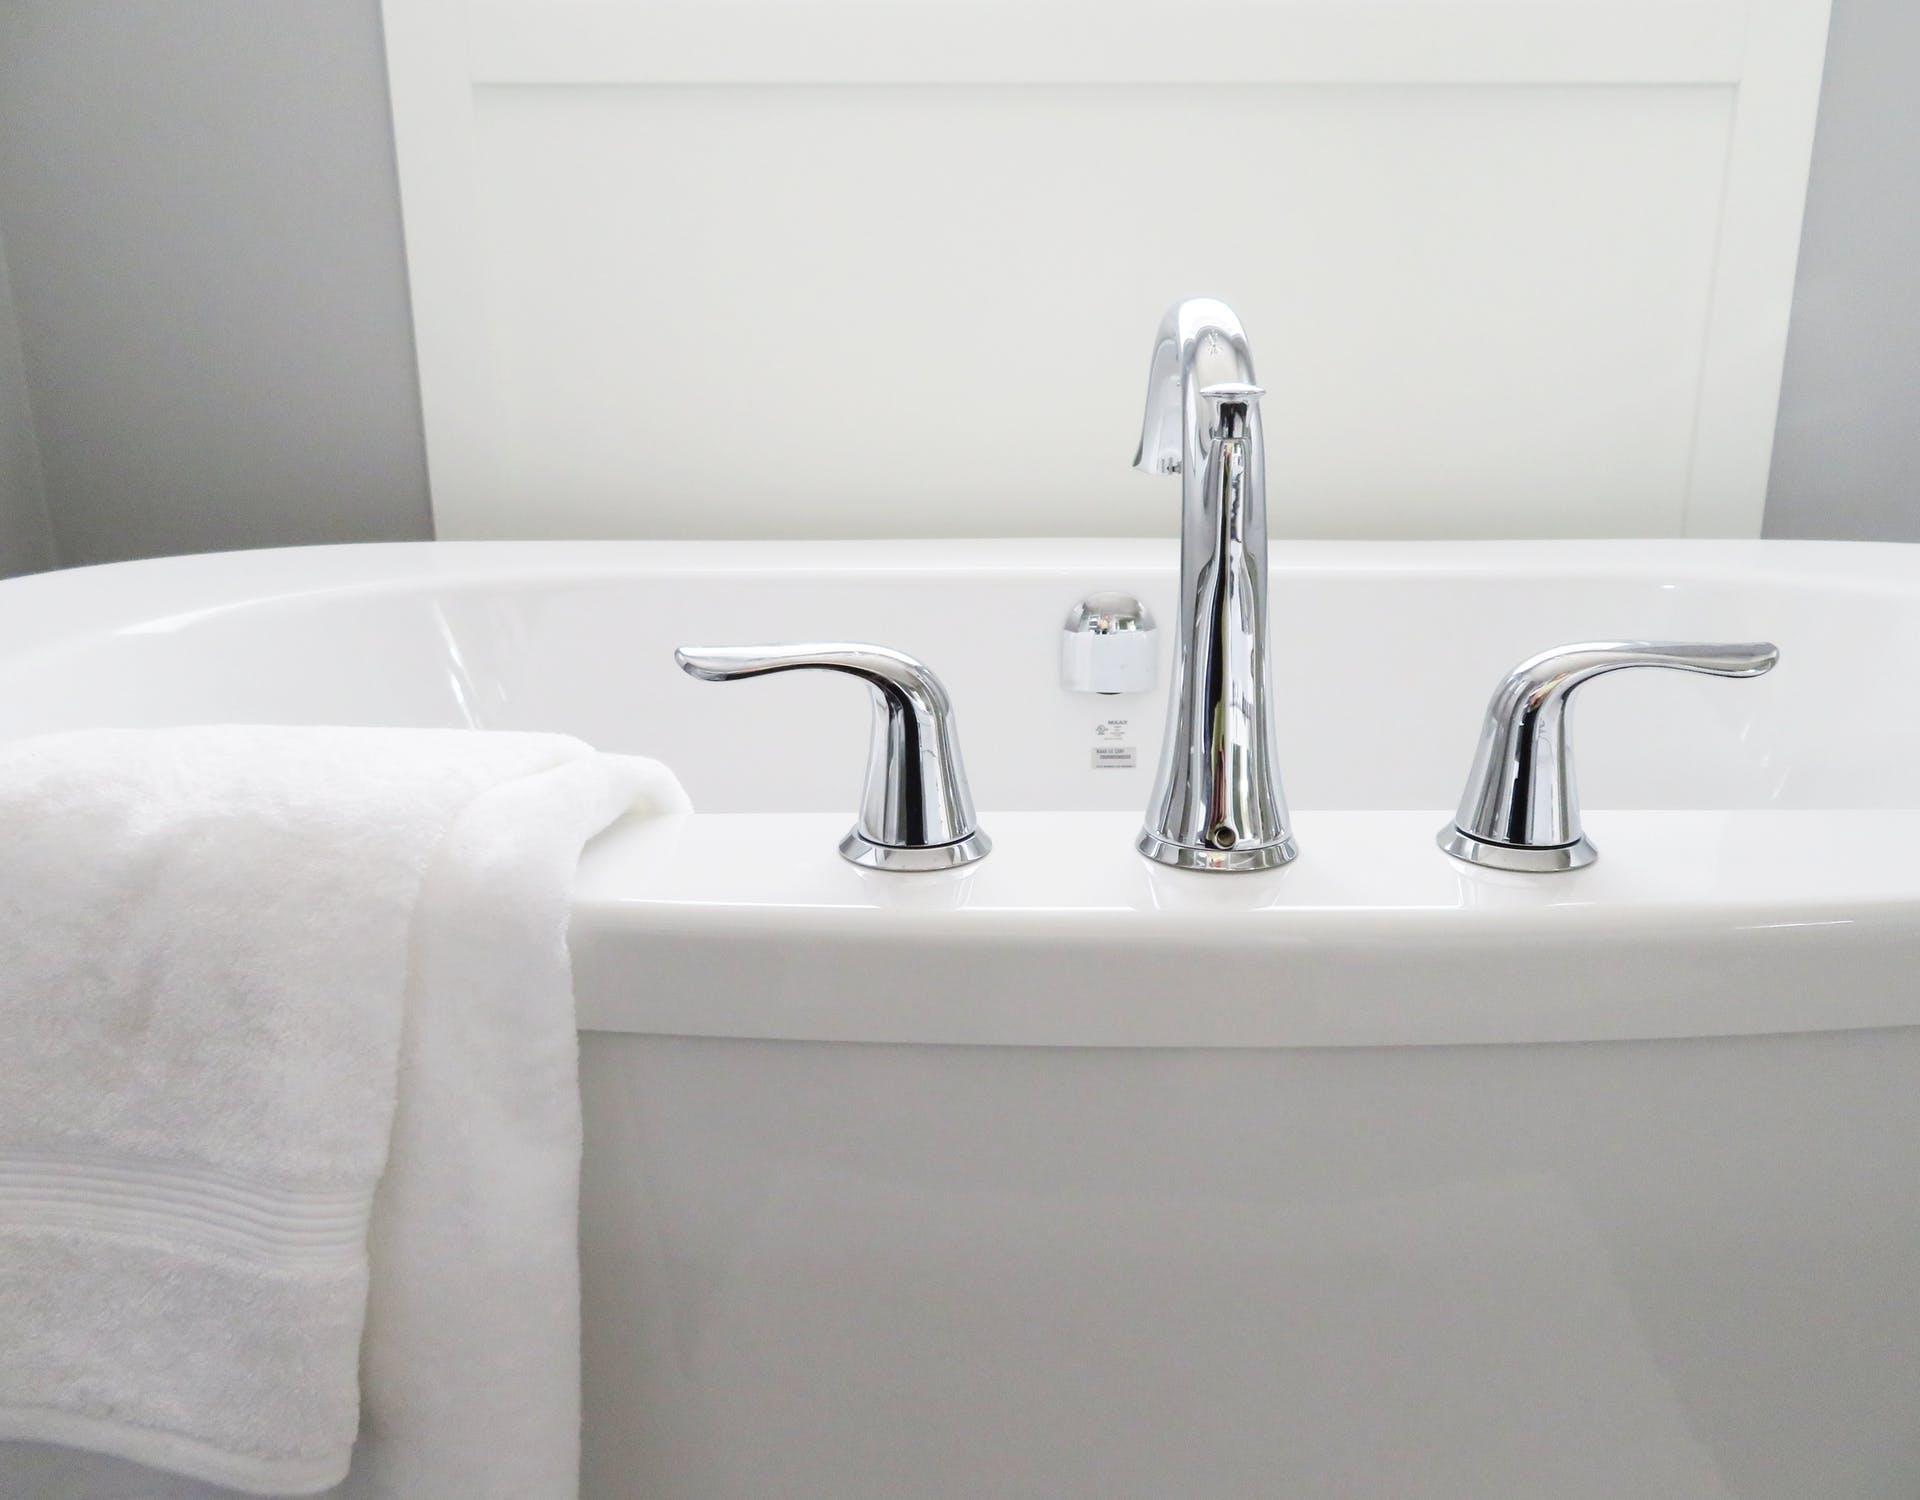 bathtub-painting-resurfacing-lauderdale-by-the-sea